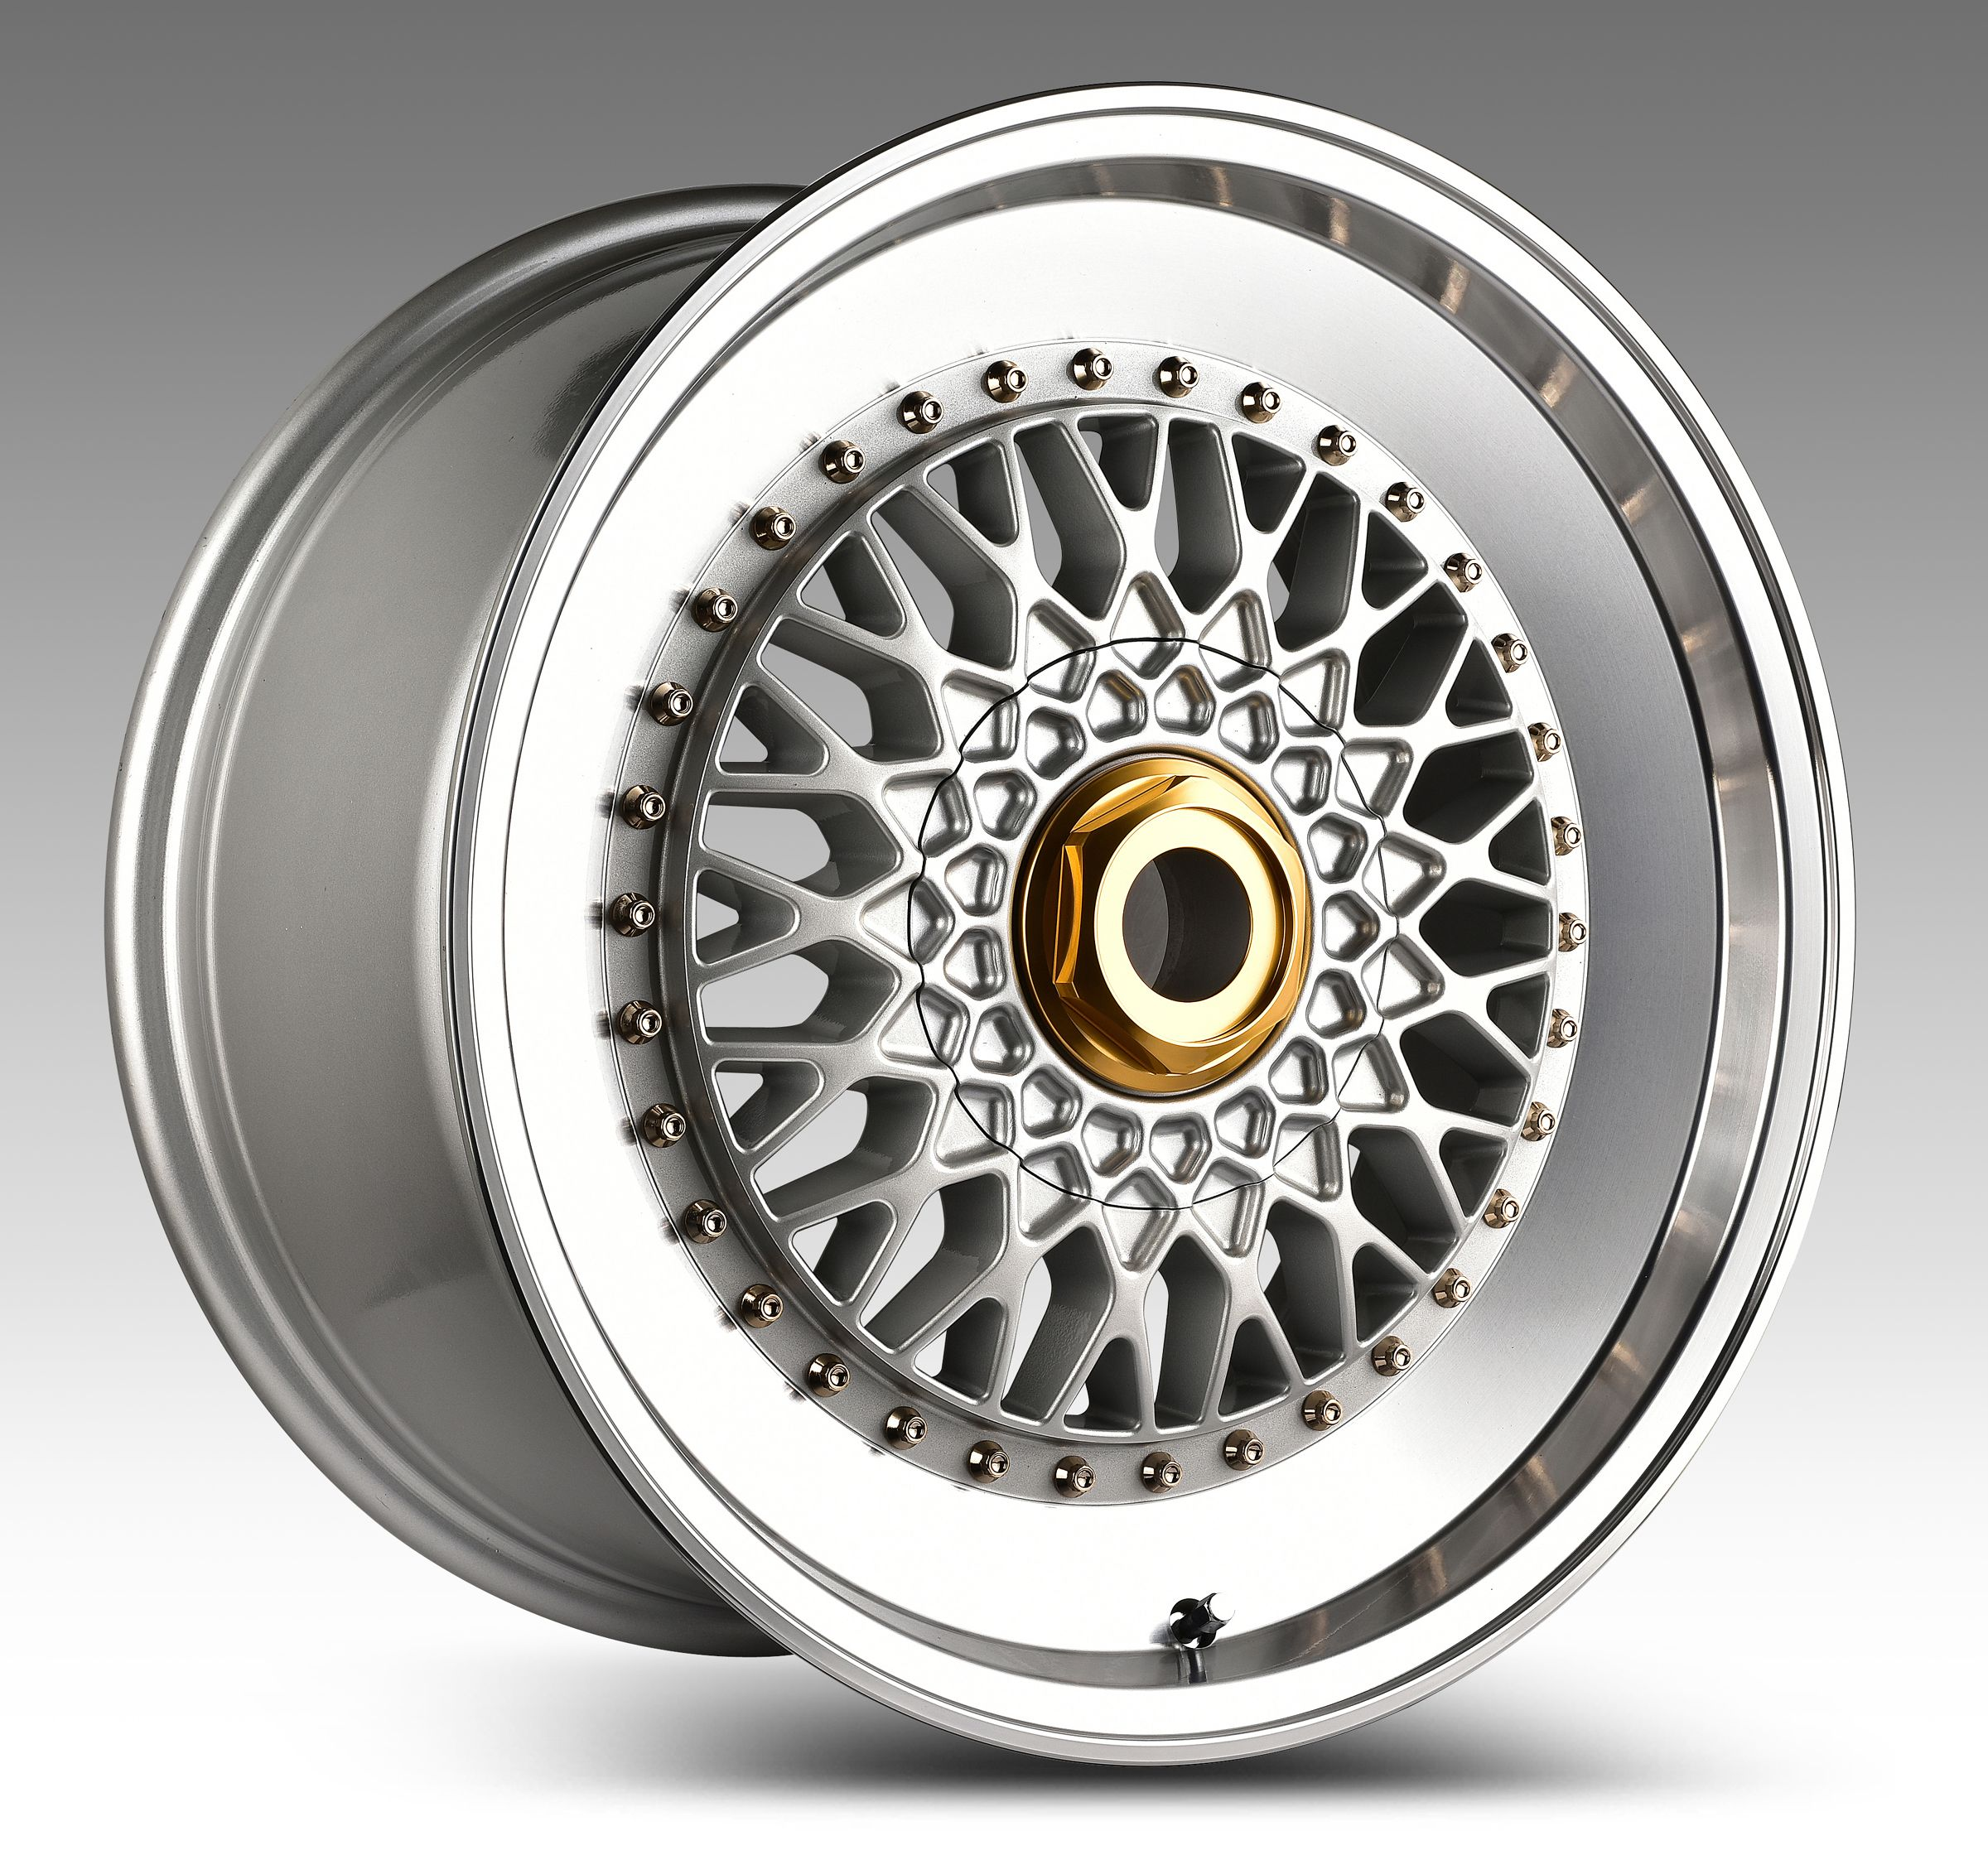 itm style bmw alloy star inv spoke factory rim set wheel series styles of